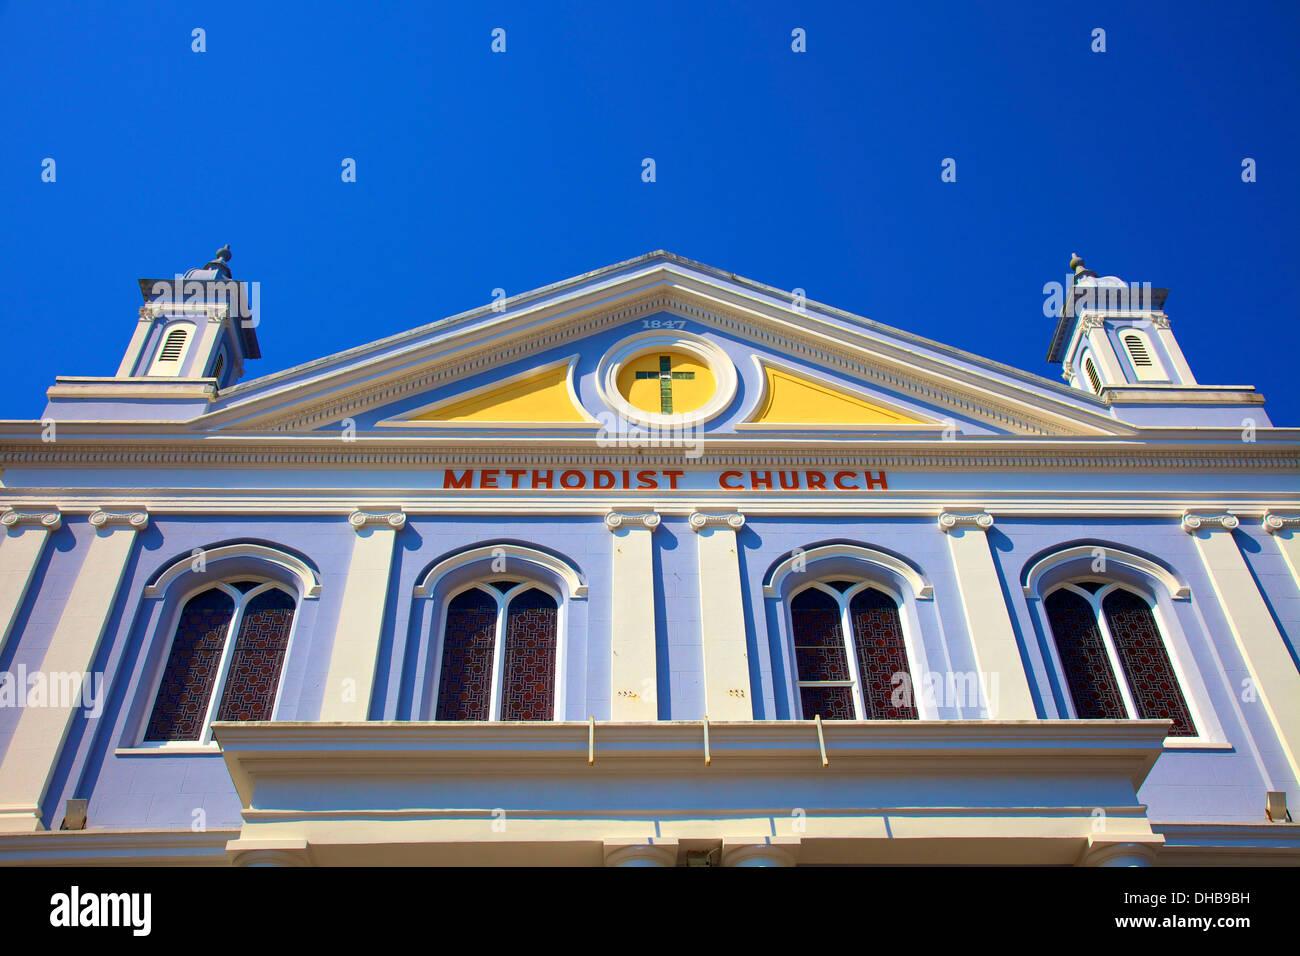 Methodist Church, St. Helier, Jersey, Channel Islands - Stock Image